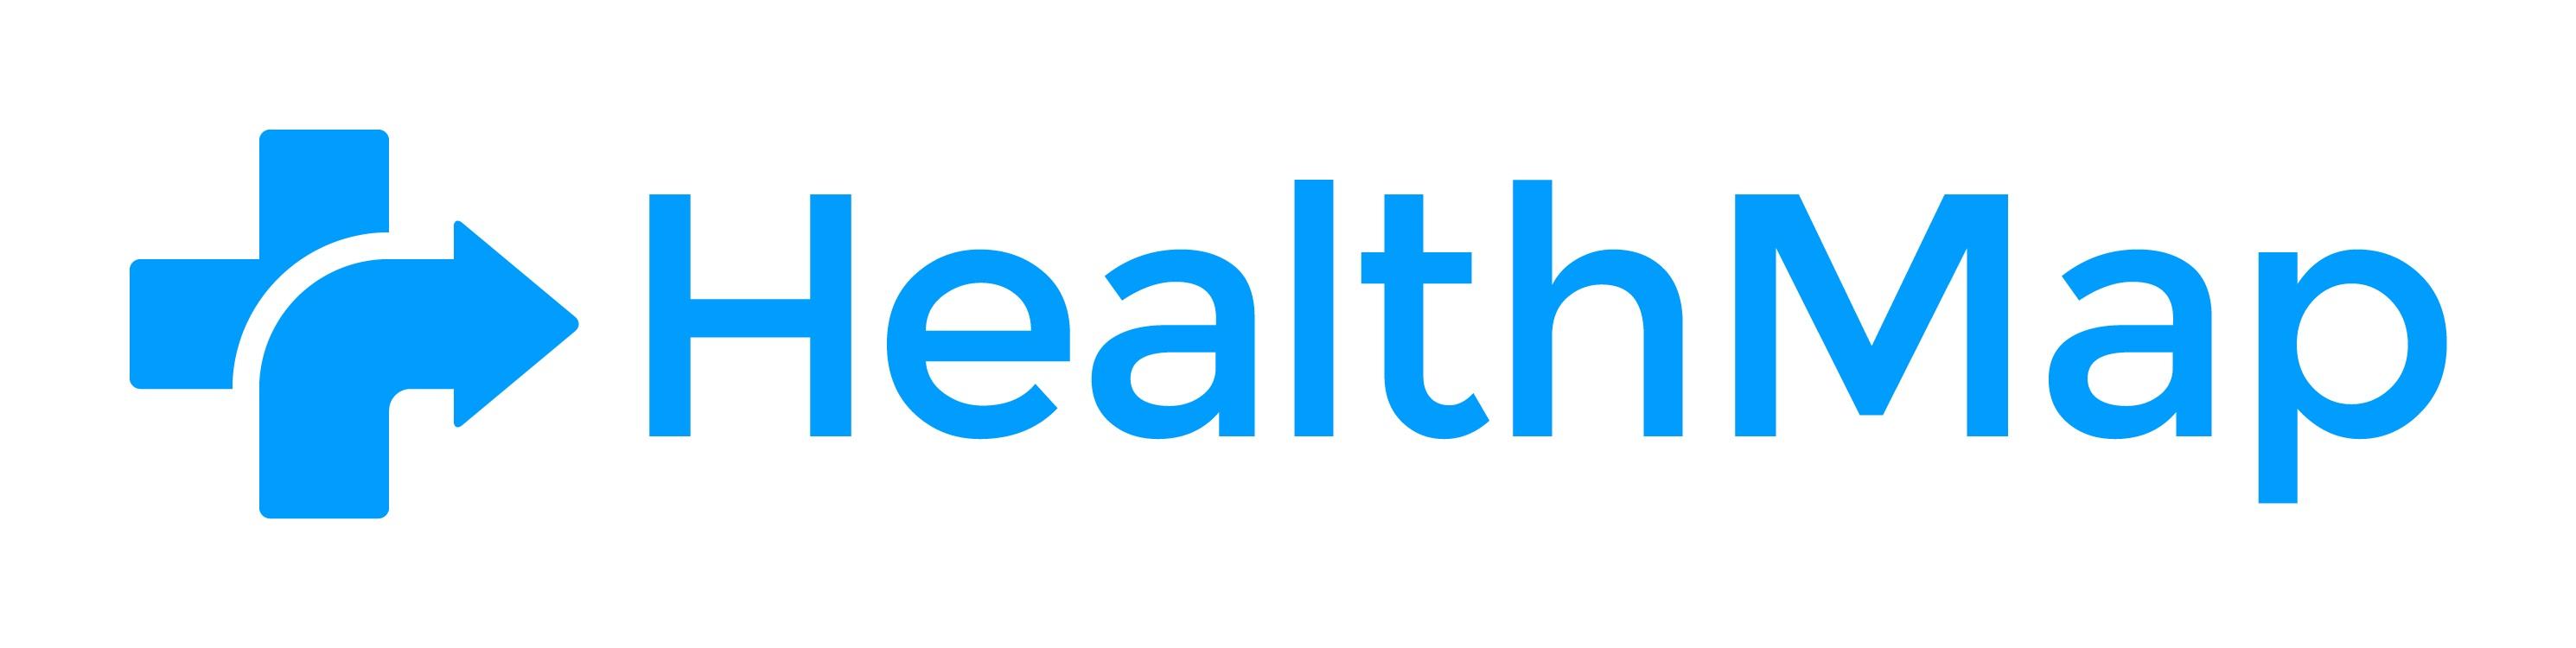 HealthMap logo